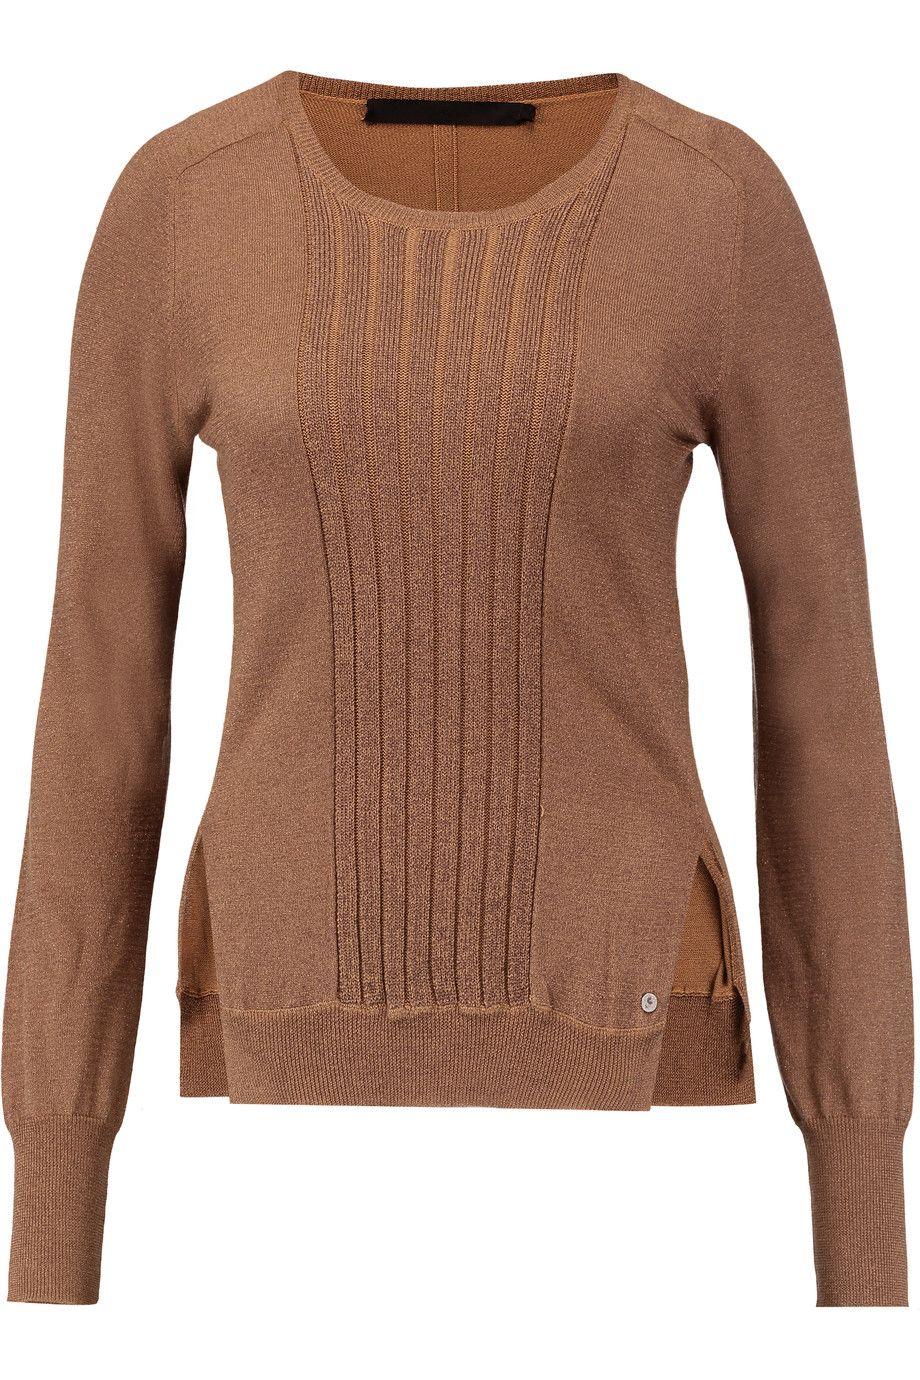 KARL LAGERFELD Macy Silk And Cotton-Blend Sweater. #karllagerfeld #cloth #sweater